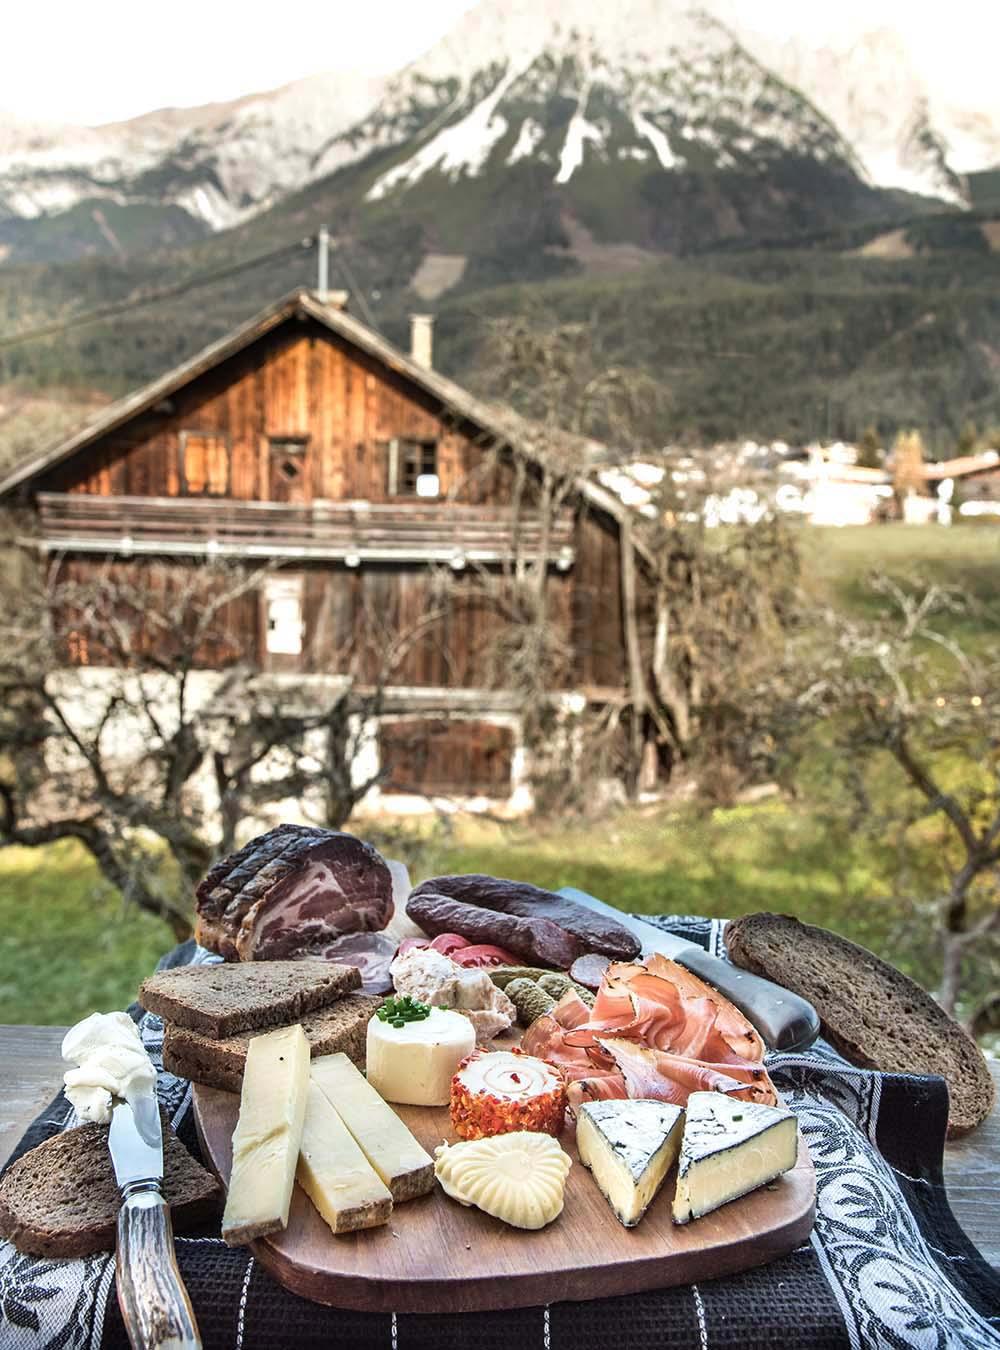 Original Tiroler Marend, oder wie eine gute Brettljause geht #sennermeetsblogger - s-Küche